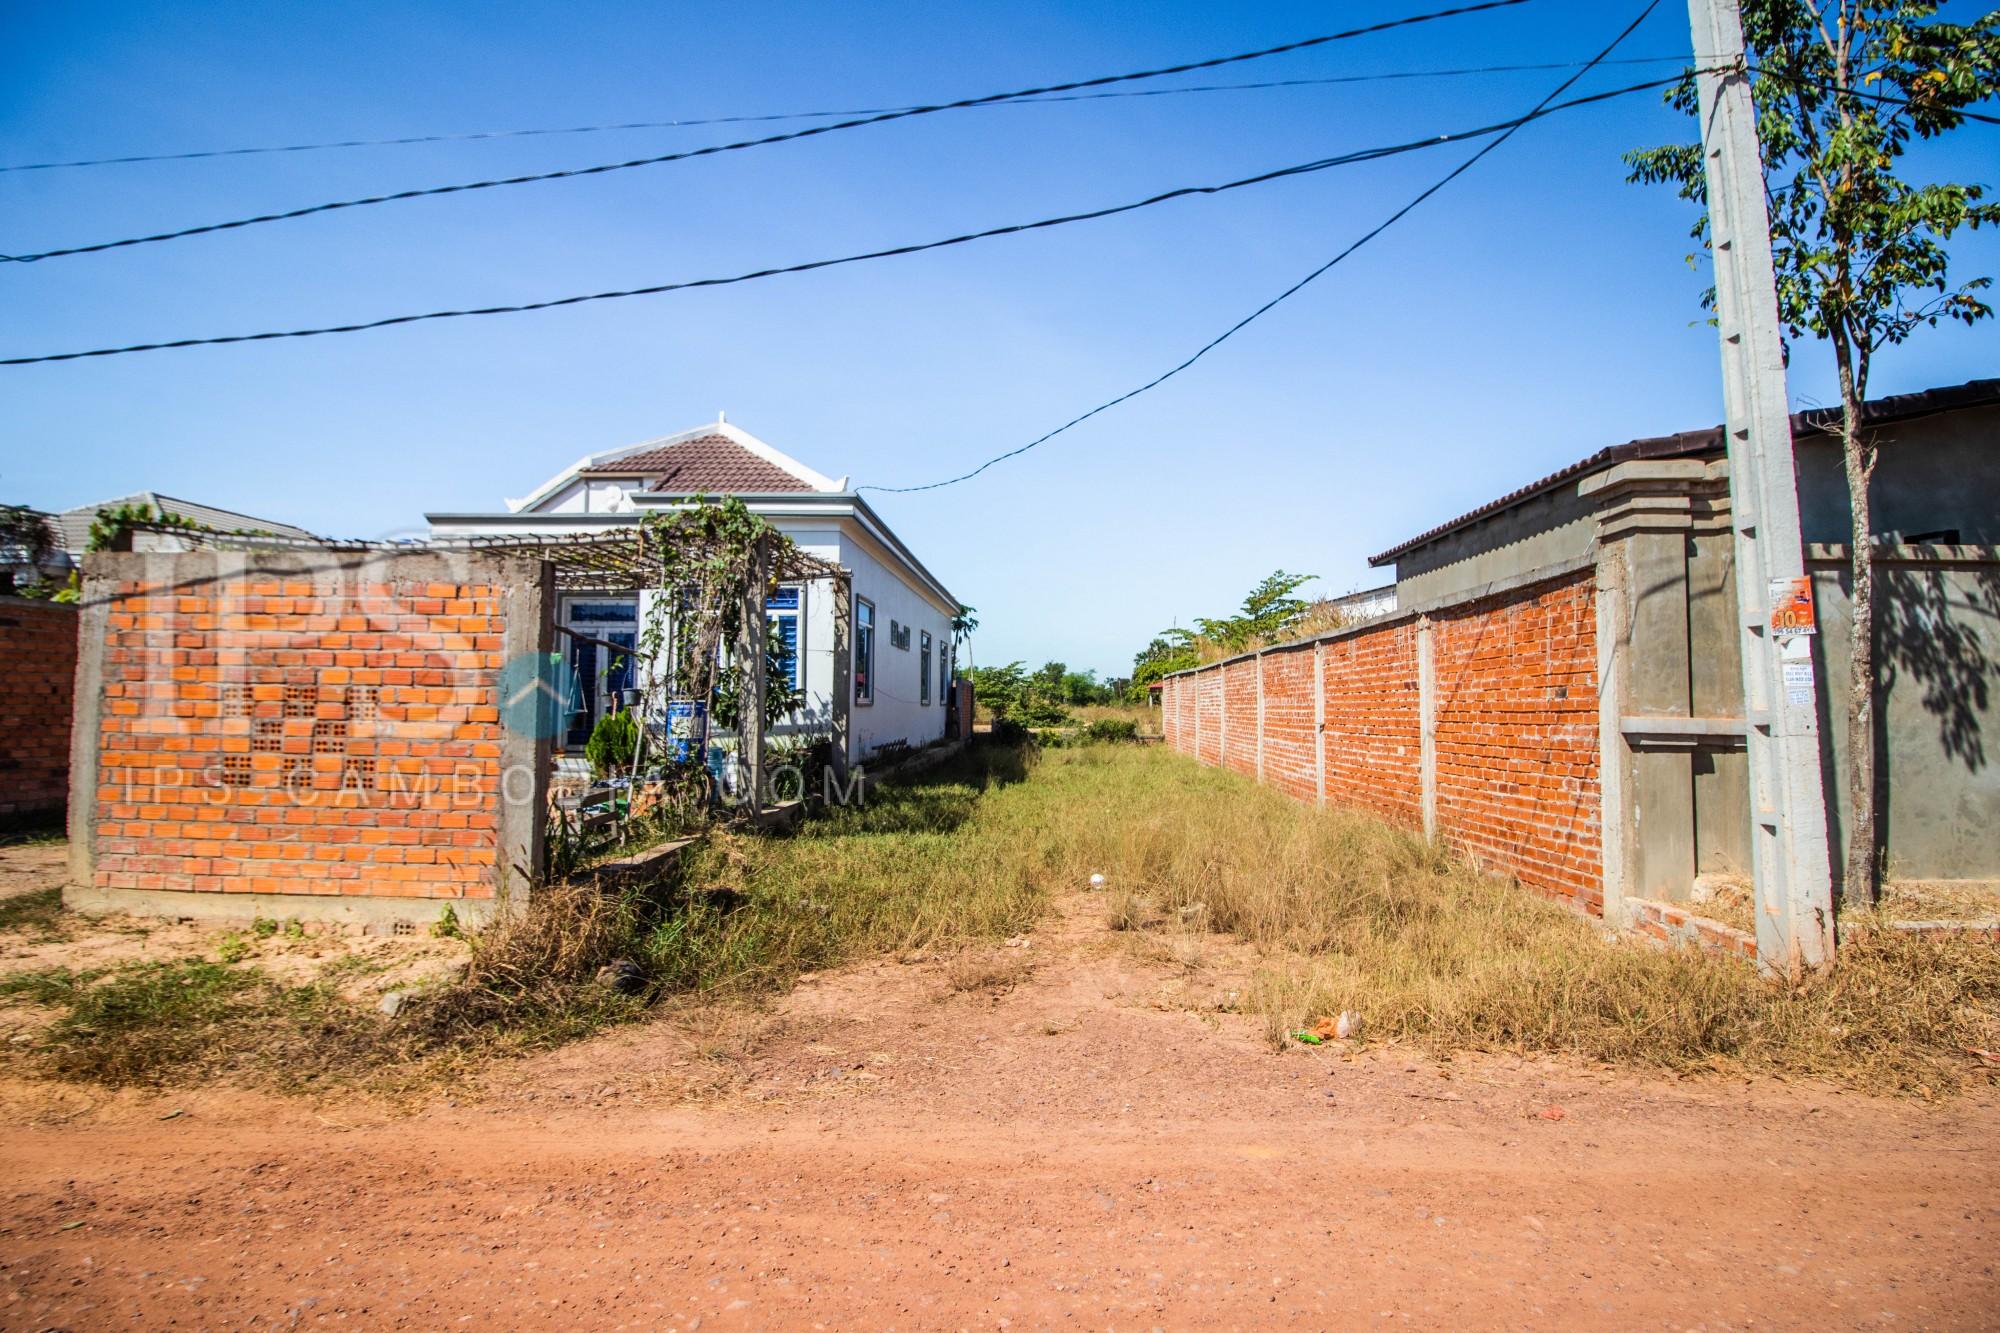 210 Sqm. Land For Sale - Sra Ngae, Siem Reap